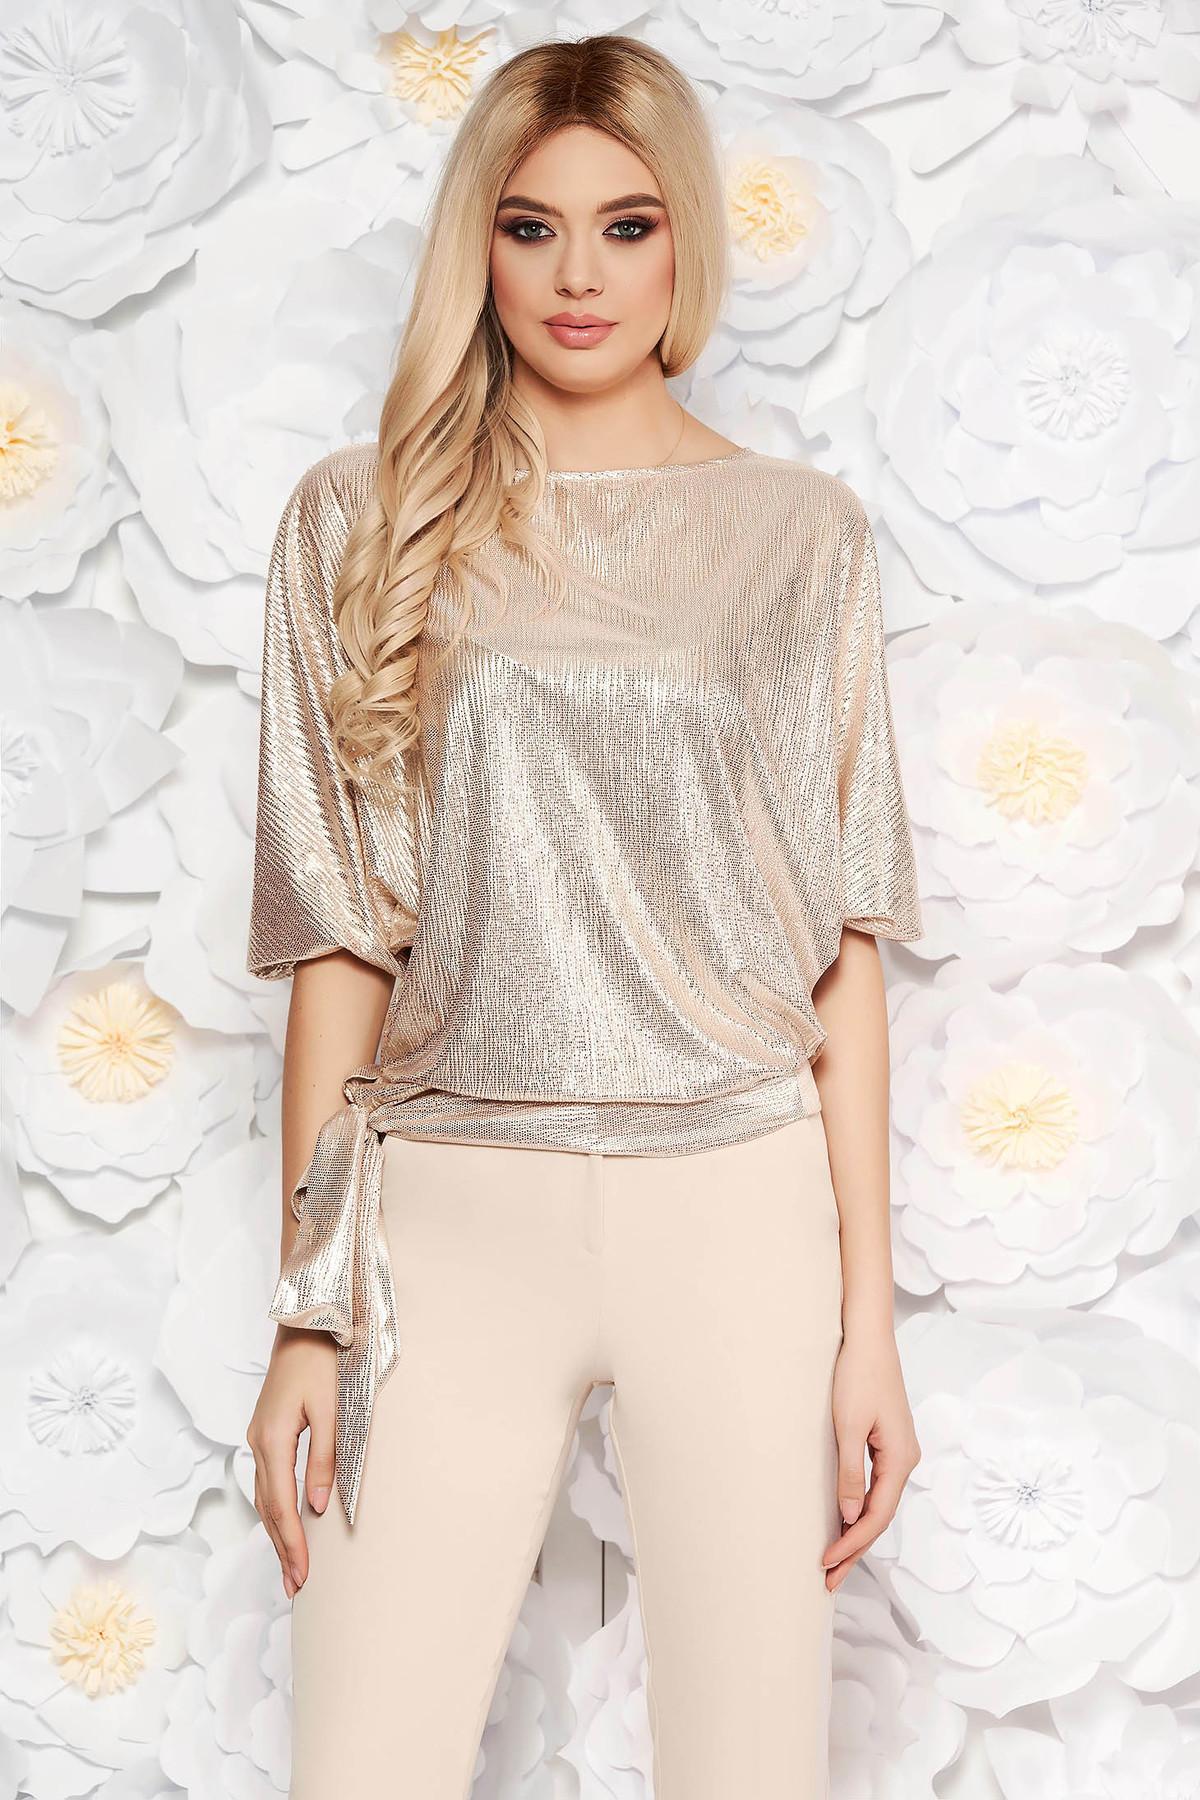 58b64230bd Új StarShinerS márkájú ruhák online | akciok-blackfriday.hu